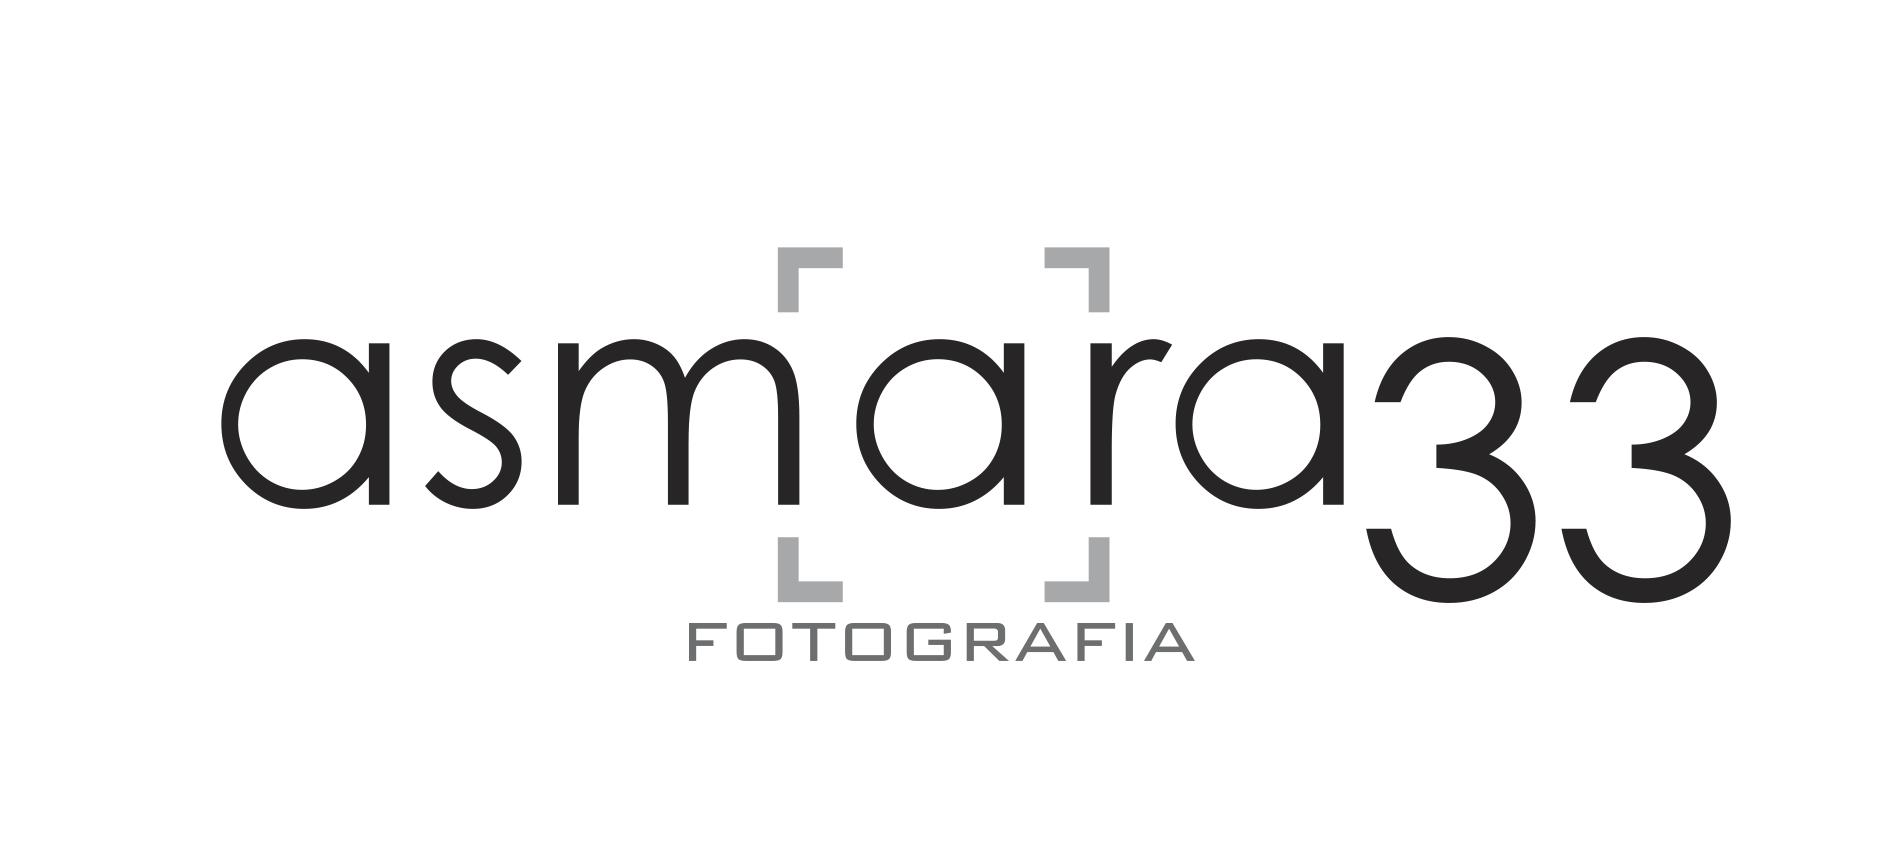 Asmara 33 Fotografia